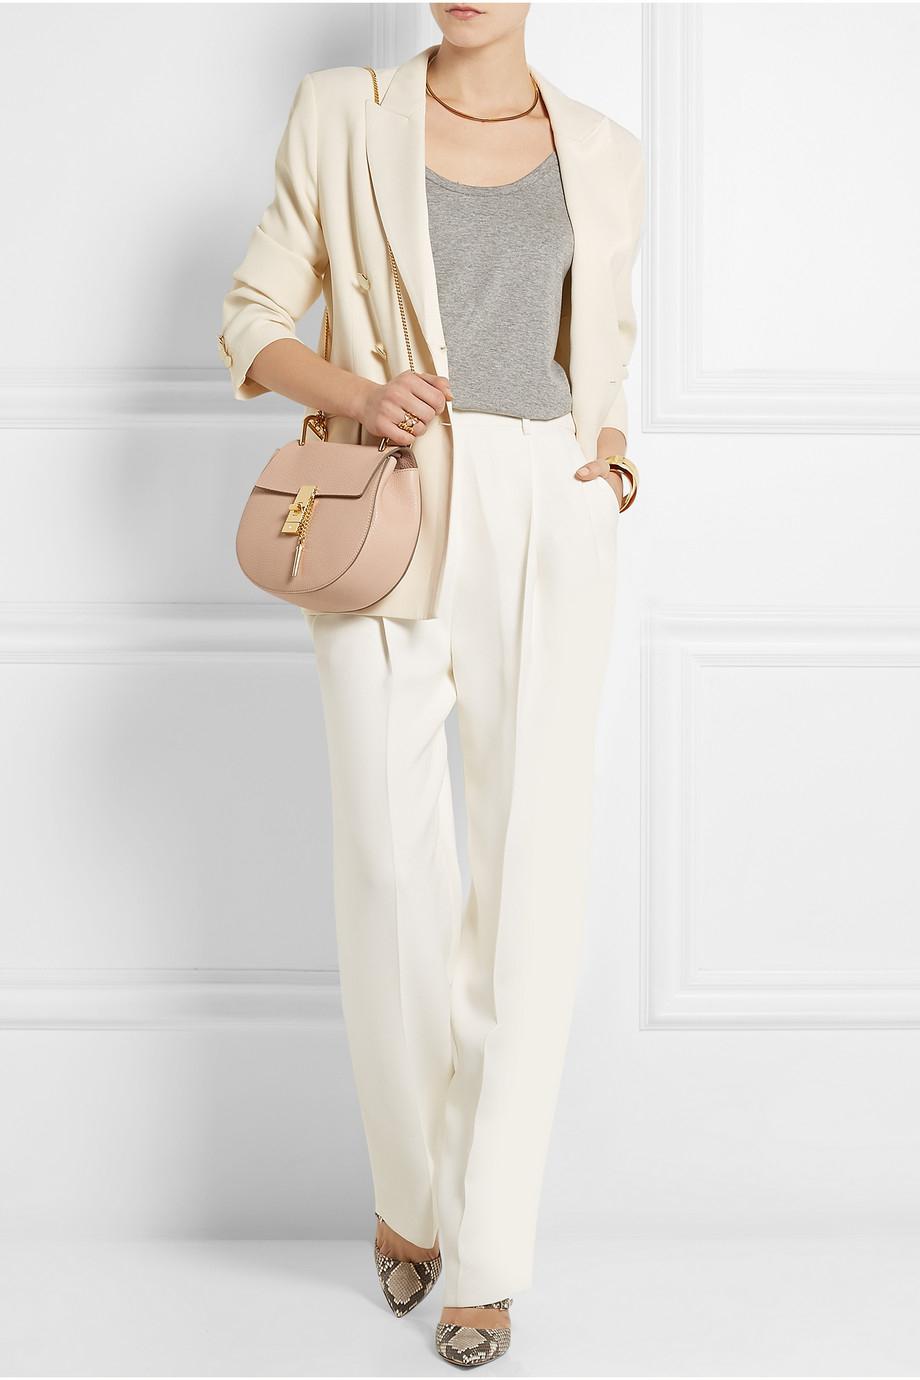 8b00f264802cc Chlo   Drew Medium Textured-Leather Shoulder Bag in Pink | Lyst